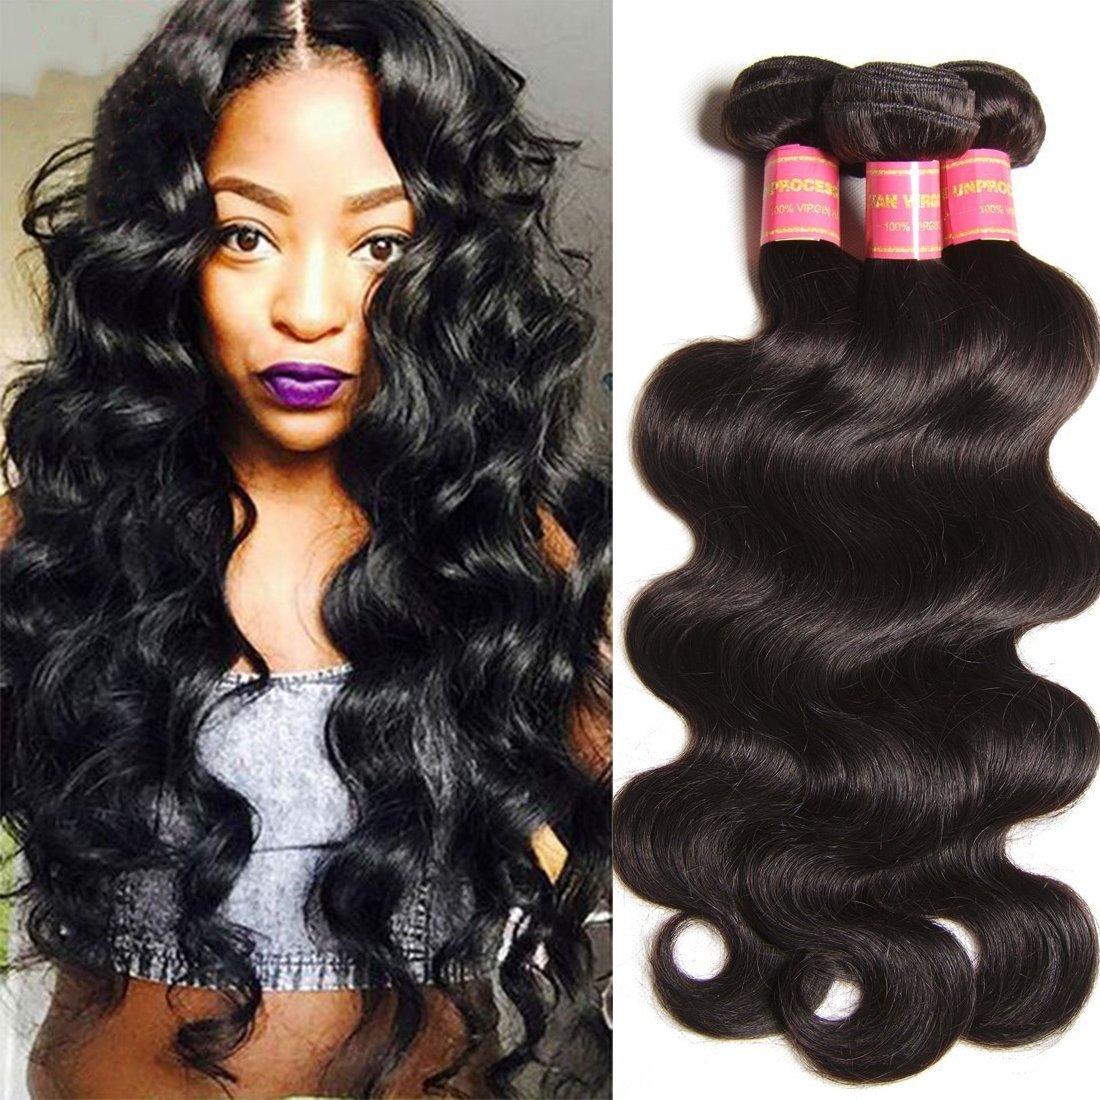 Buy Yiroo 6a Grade Malaysian Hair 16 18 20 Inch Body Wave Hair 3